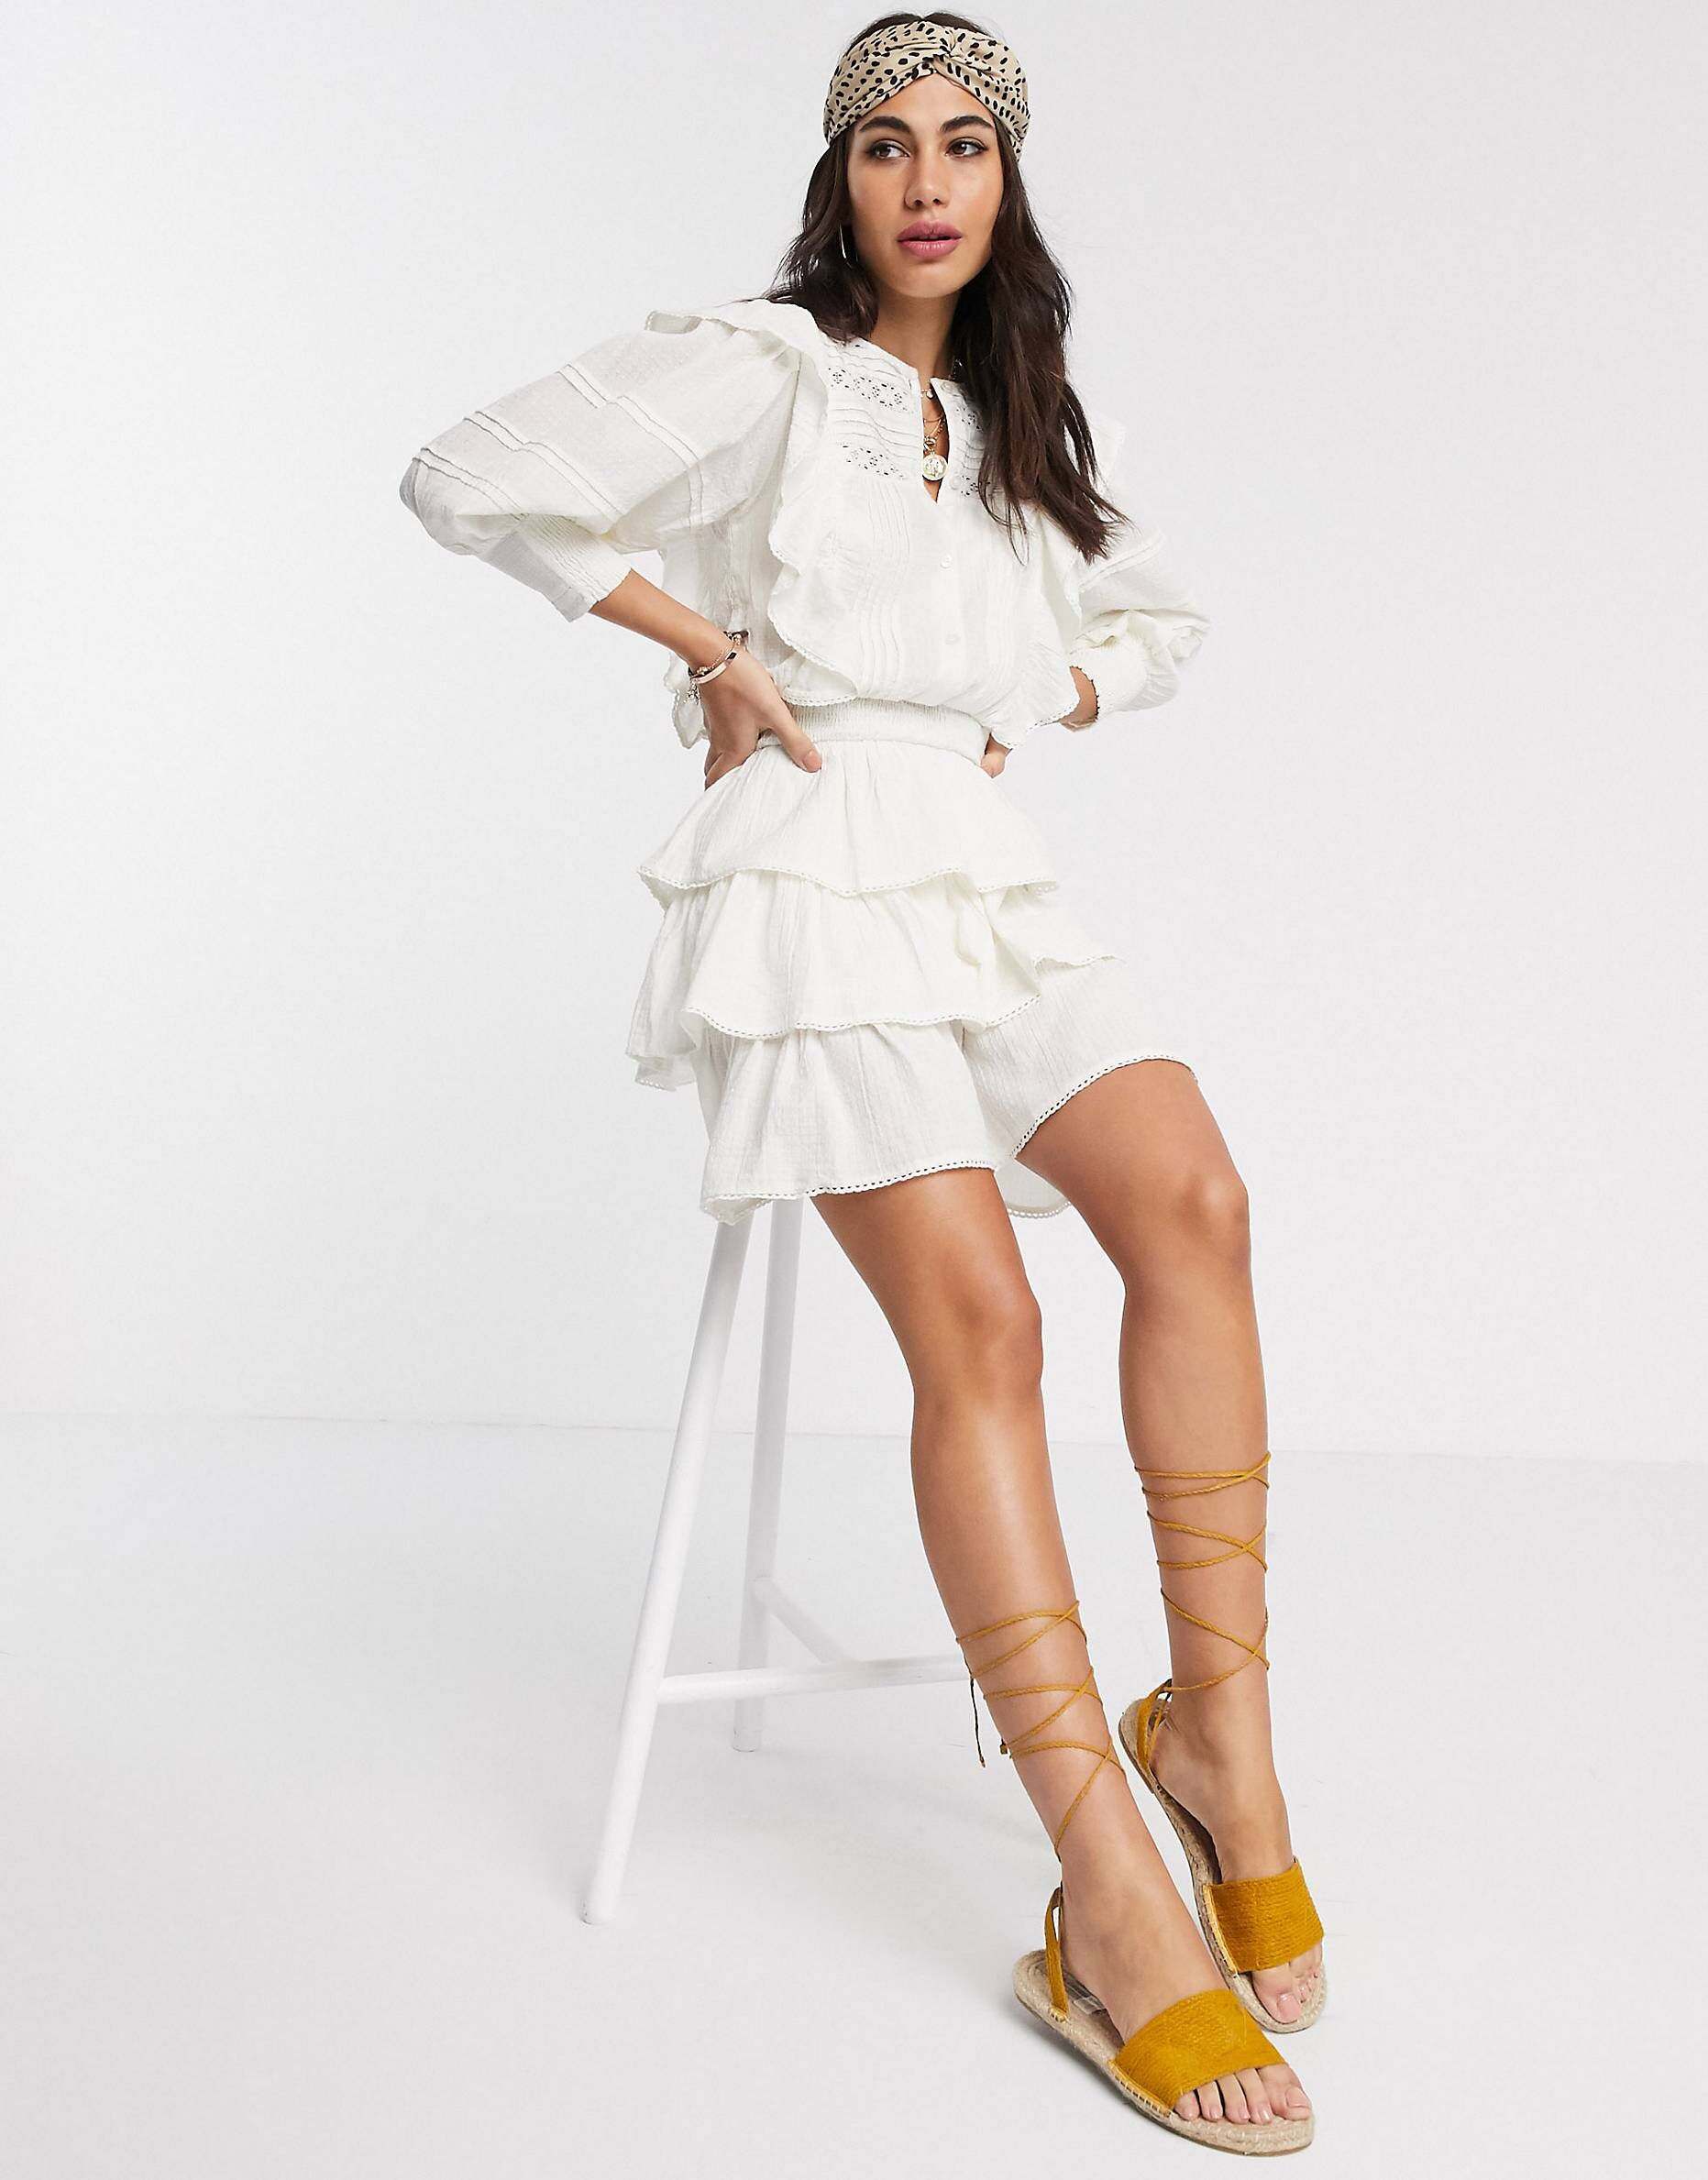 Pin By Rio Schwalbach On Vacation Outfits White Dress Women Dress Online Mini Dress [ 2378 x 1863 Pixel ]